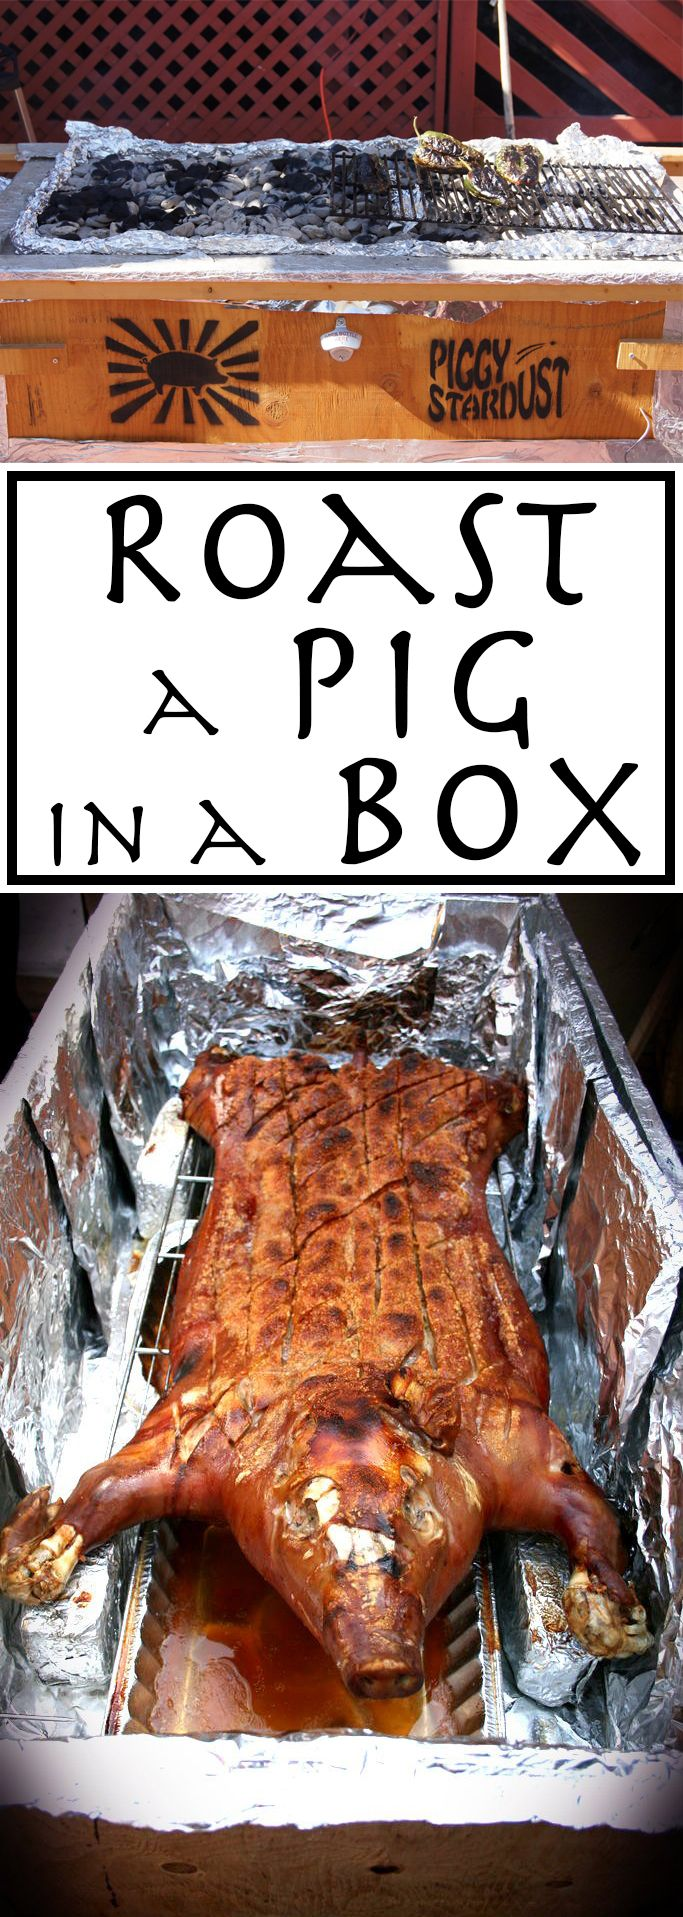 La China Caja Pig Roaster